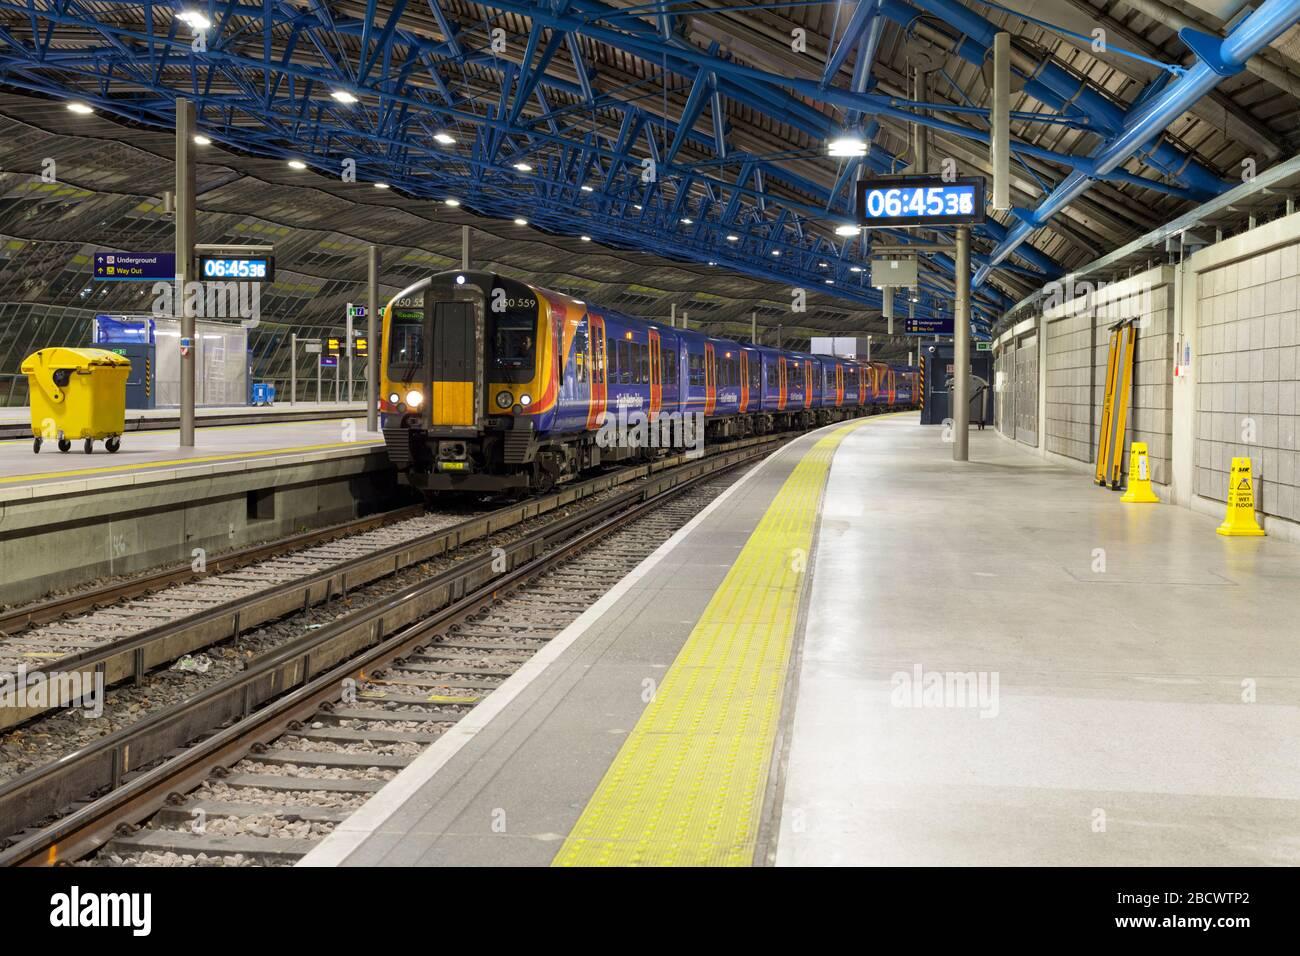 South Western railway Siemens Desiro class 450 trains at London Waterloo railway station in the old Waterloo international Eurostar station platforms Stock Photo